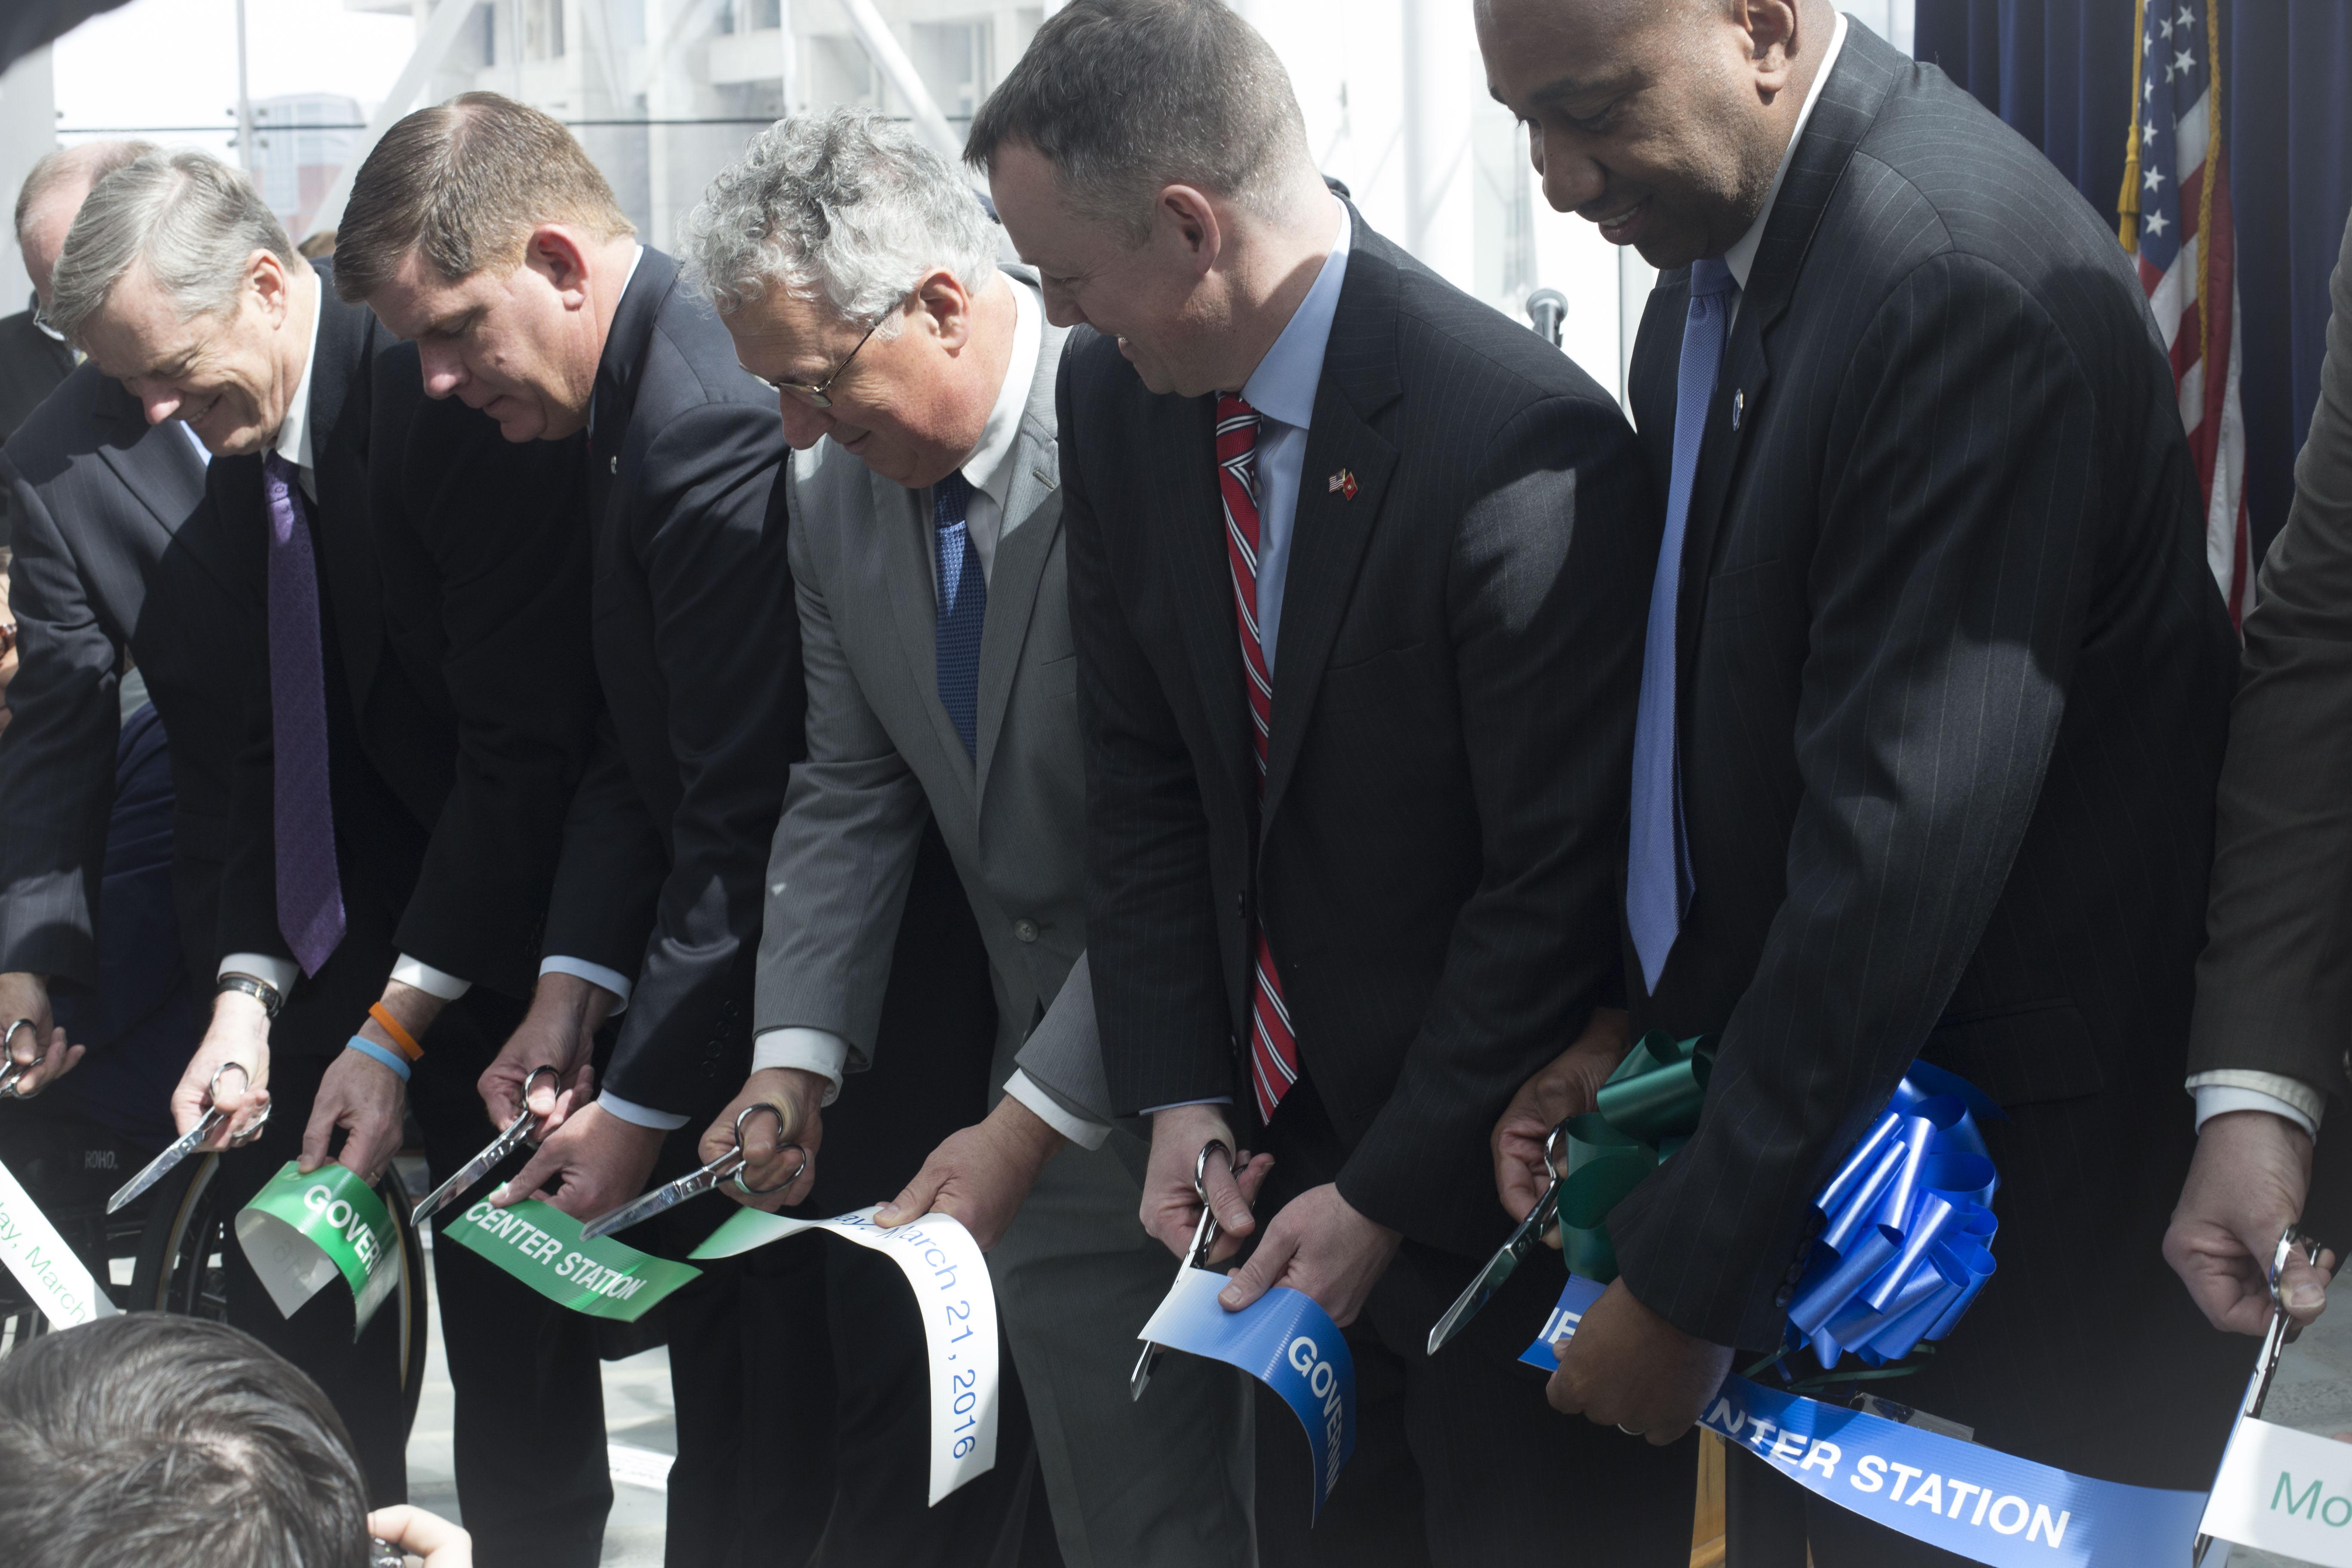 Renovated Govt  Center MBTA Station Re-Opens – Boston